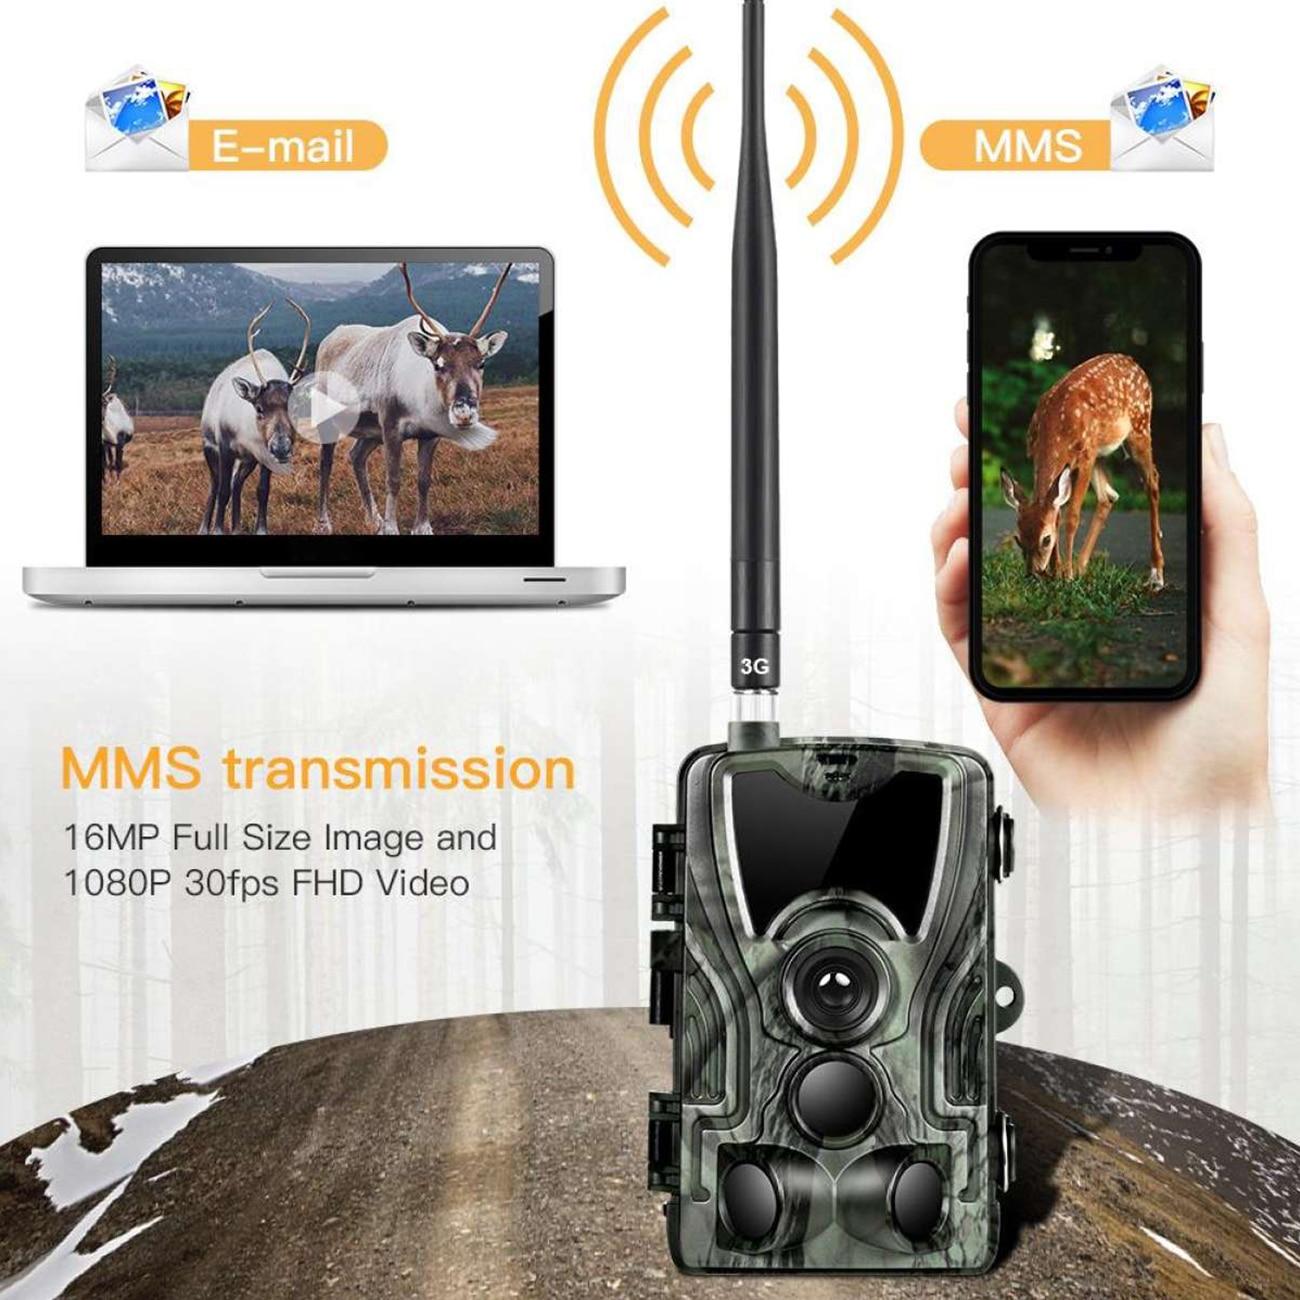 HC-810G 3G Video Hunting Camera 1080P 16MP MMS SMTP SMS Infrared Night Vision Trail Camera Outdoor Wildlife Surveillance Camera